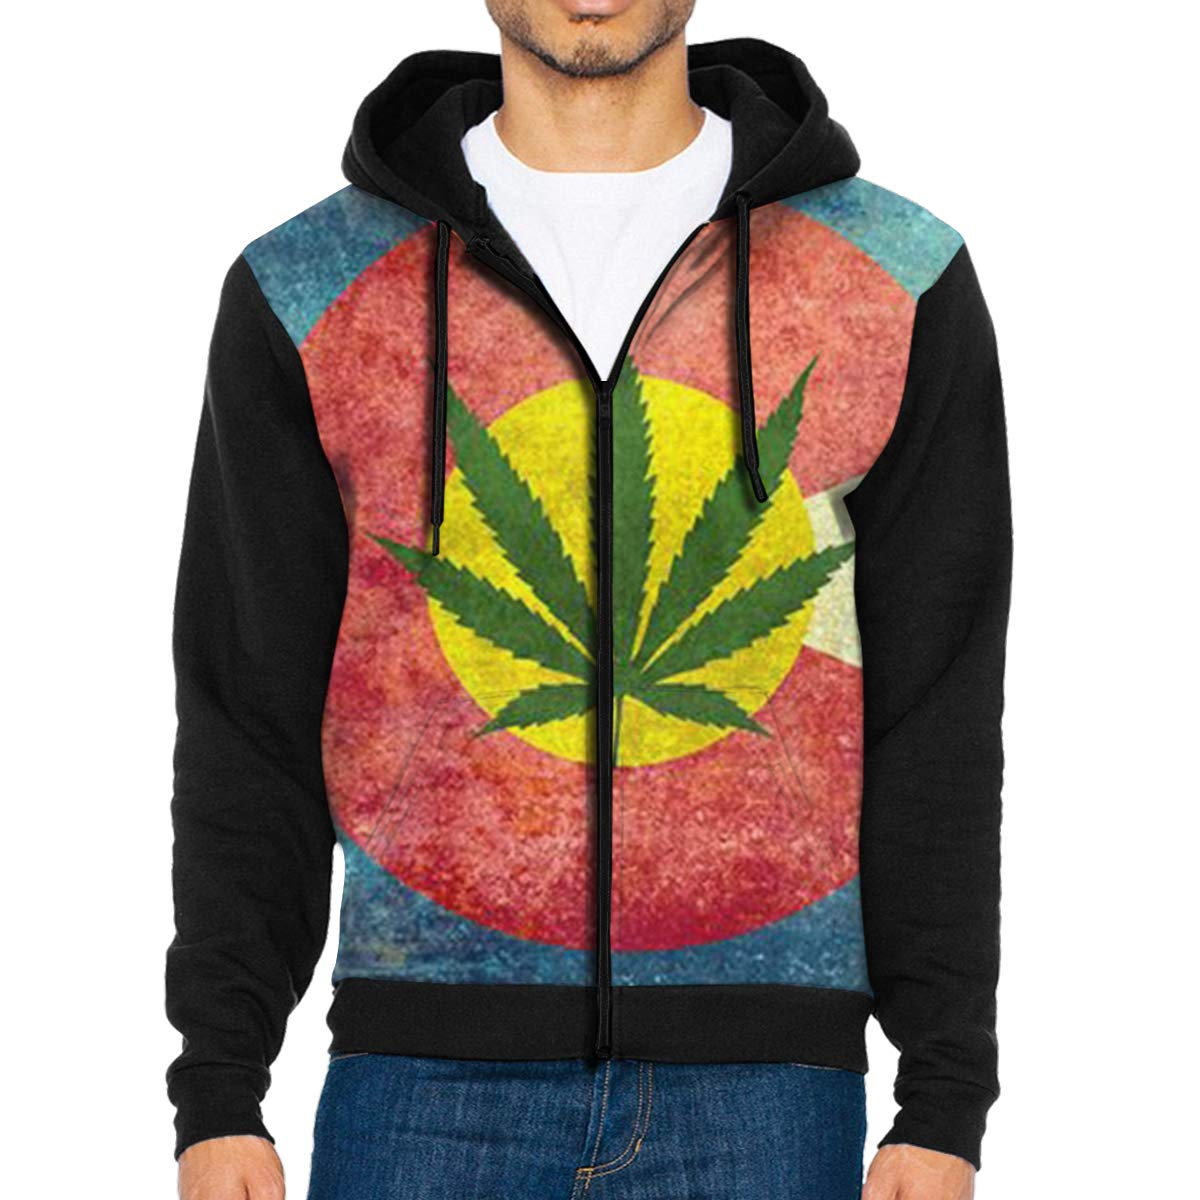 G-Fulling Retro Colorado Flag 3D Print Fashion Men's Hooded Sweatshirts Drawstring Pullover Hoodies Pockets